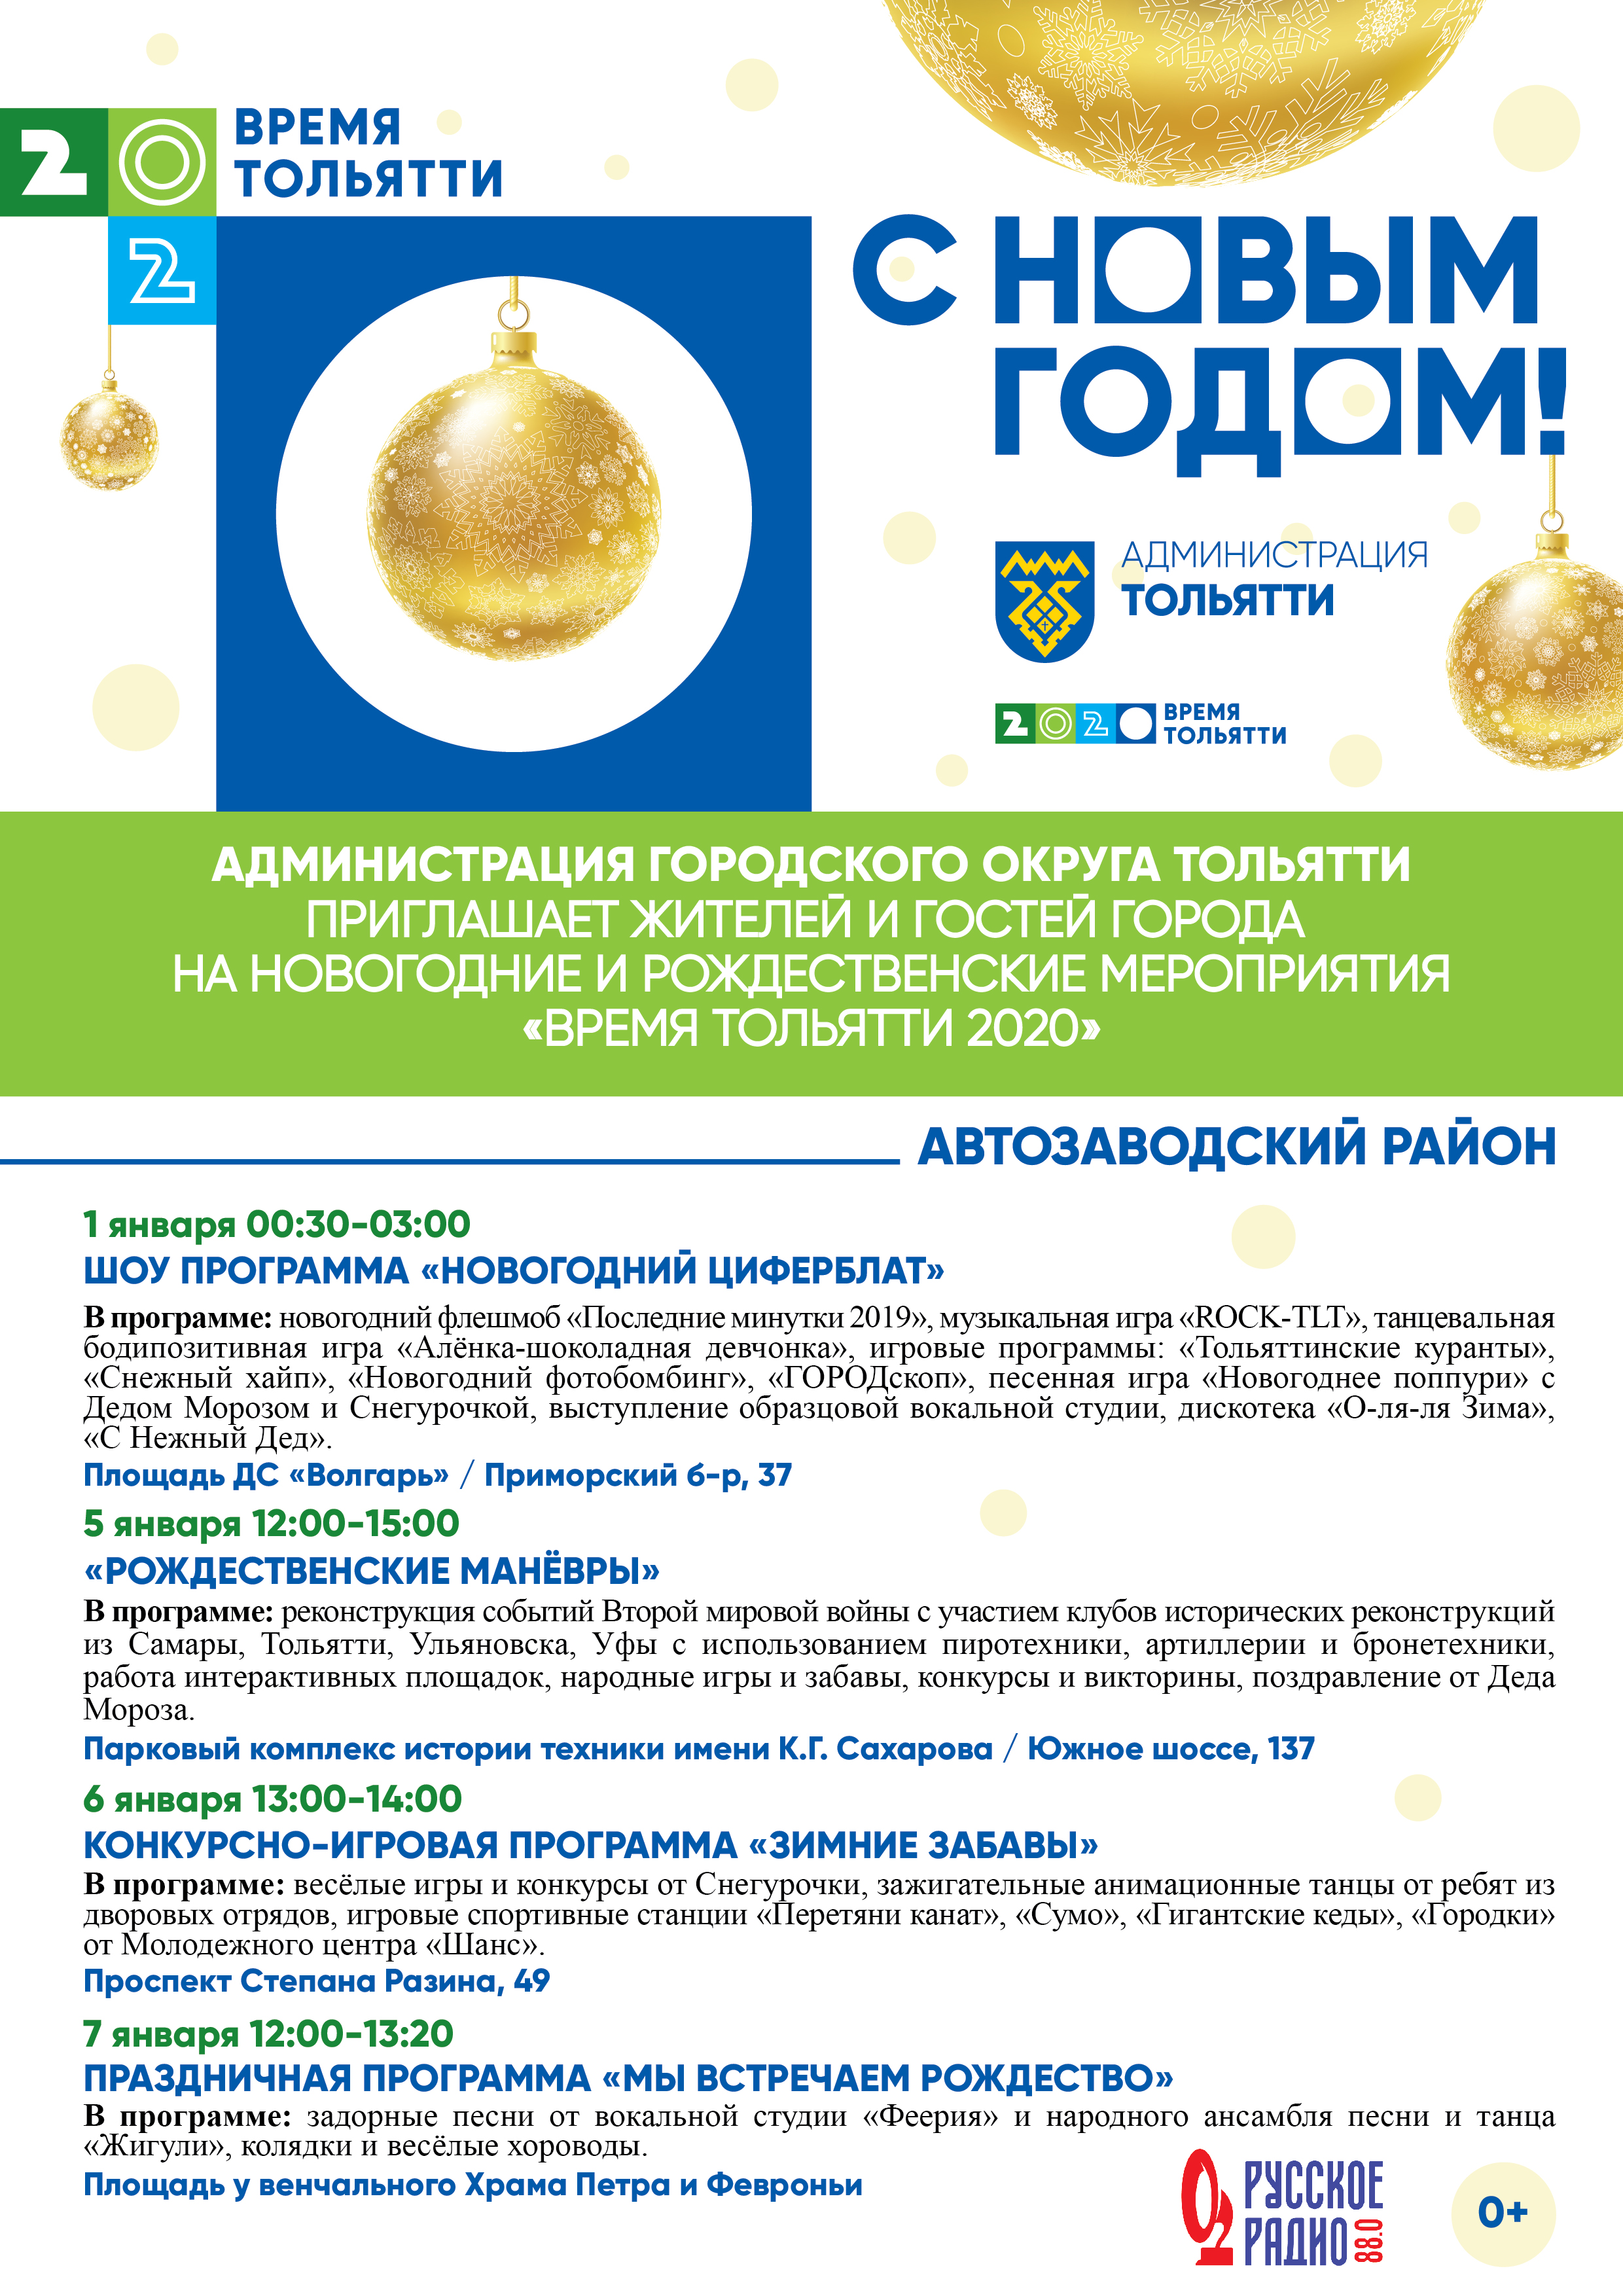 afisha-ng-2020-avtozavodskiy-y-rayon_file_1576149176